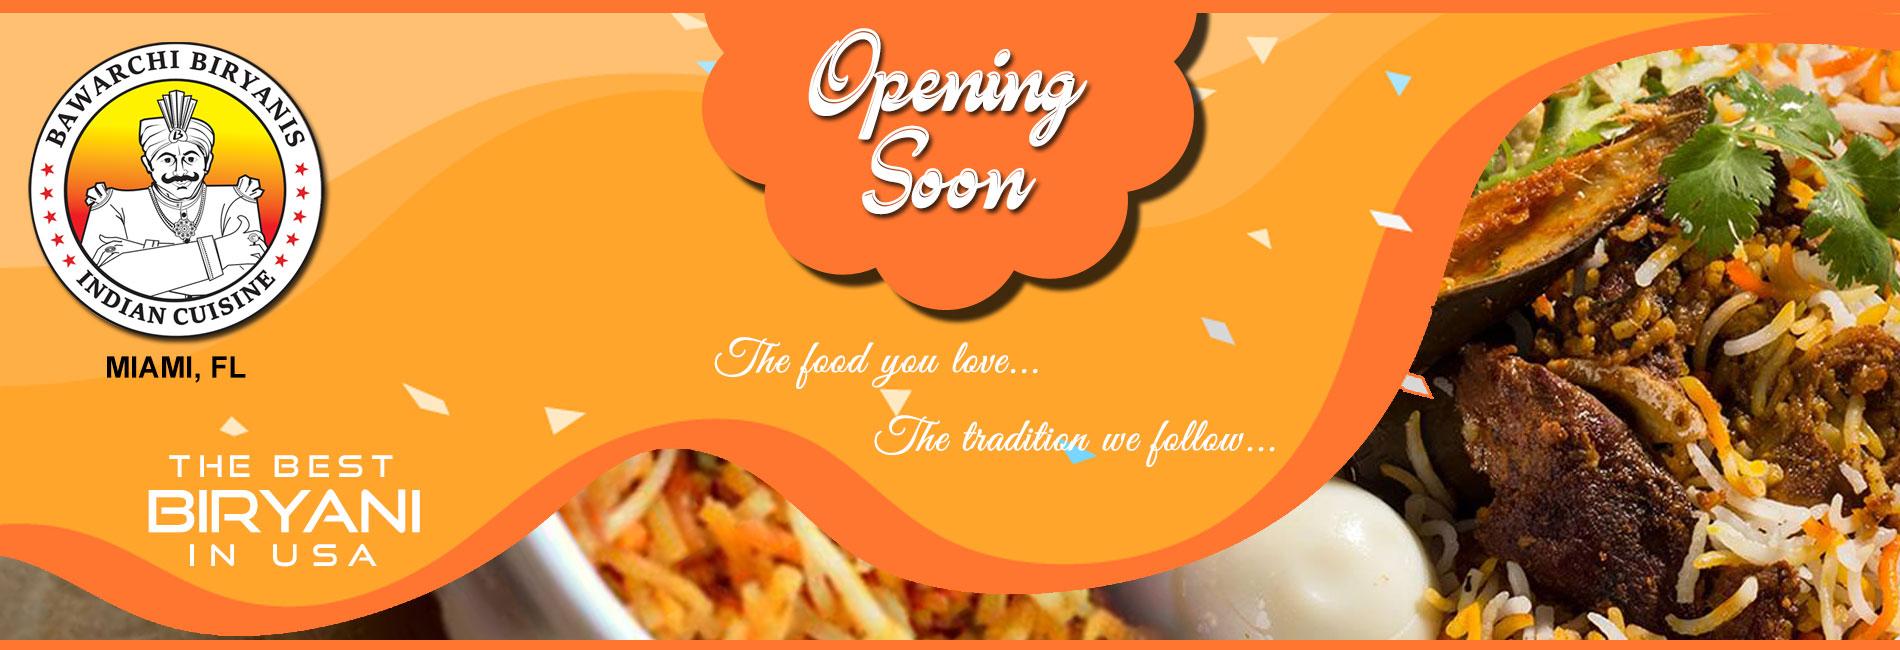 Bawarchi Miami, FL - Opening Soon